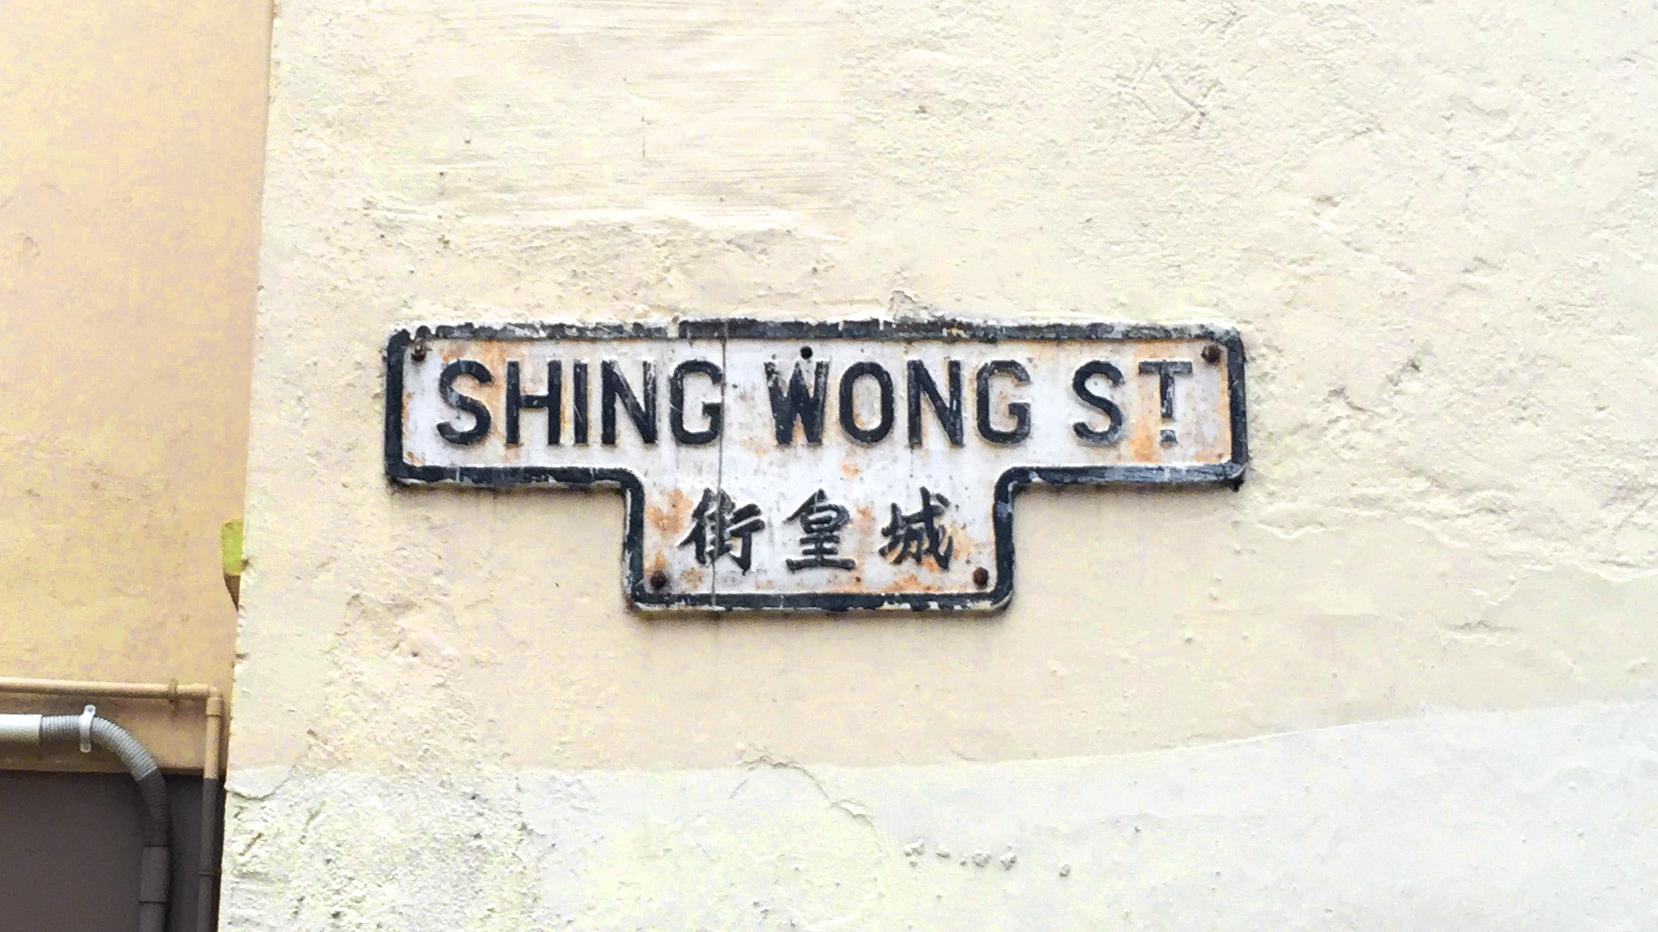 shing wong st 城皇街 由左至右讀英文 再由右至左看中文 就欣賞完這個古舊的街道牌 路牌算是很容易觀察字體的東西之一 看膩了黑白色的路牌 這個以英文為主的懷舊風格應該滿足到你 這附近比較多斜坡和樓梯 這個牌的形狀也好像在呼應著 illustrators